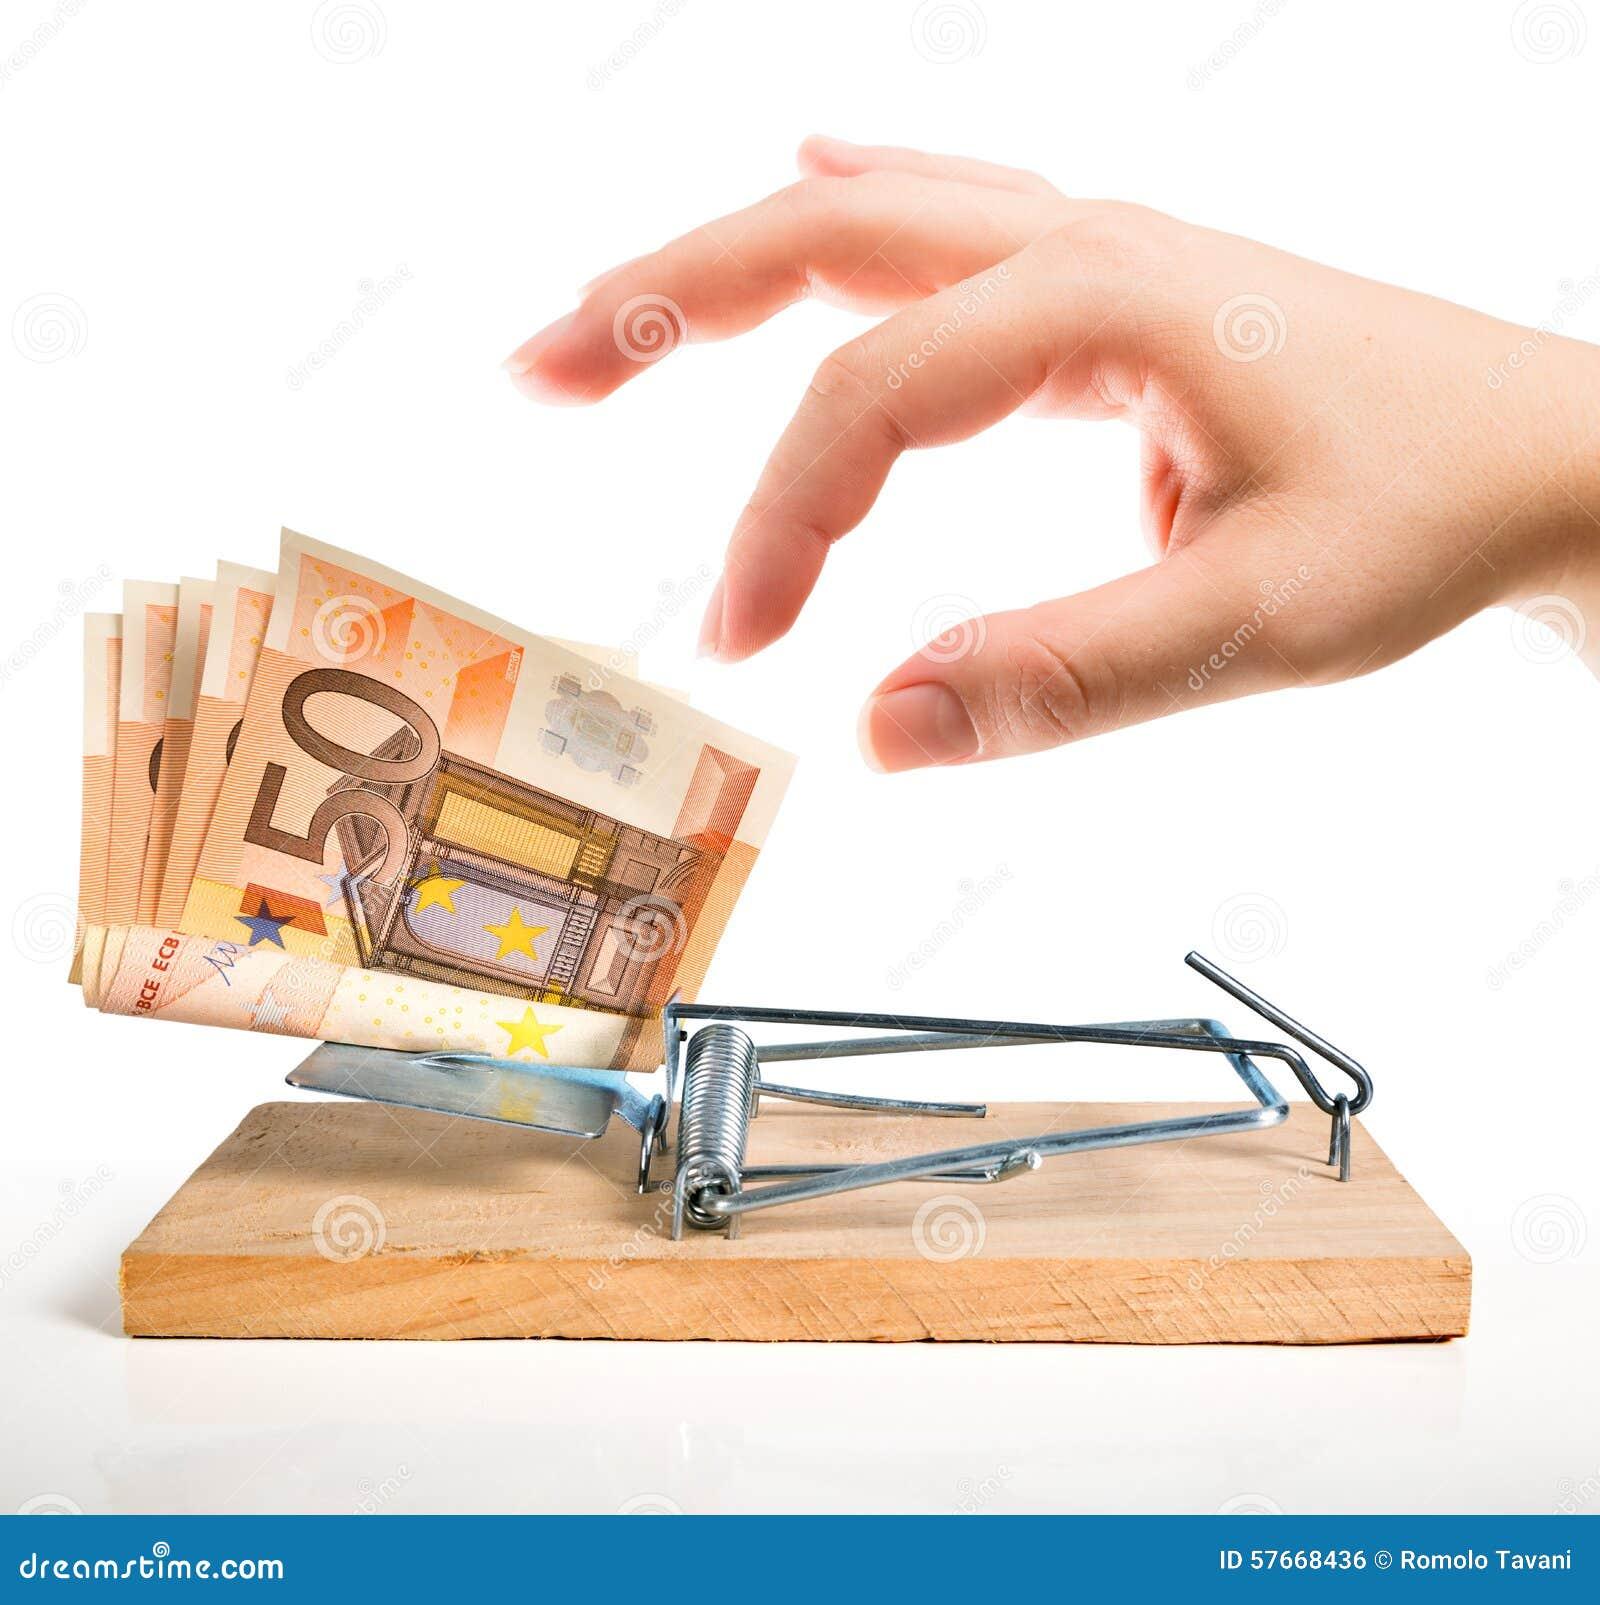 Armadilha do dinheiro - euro- isca